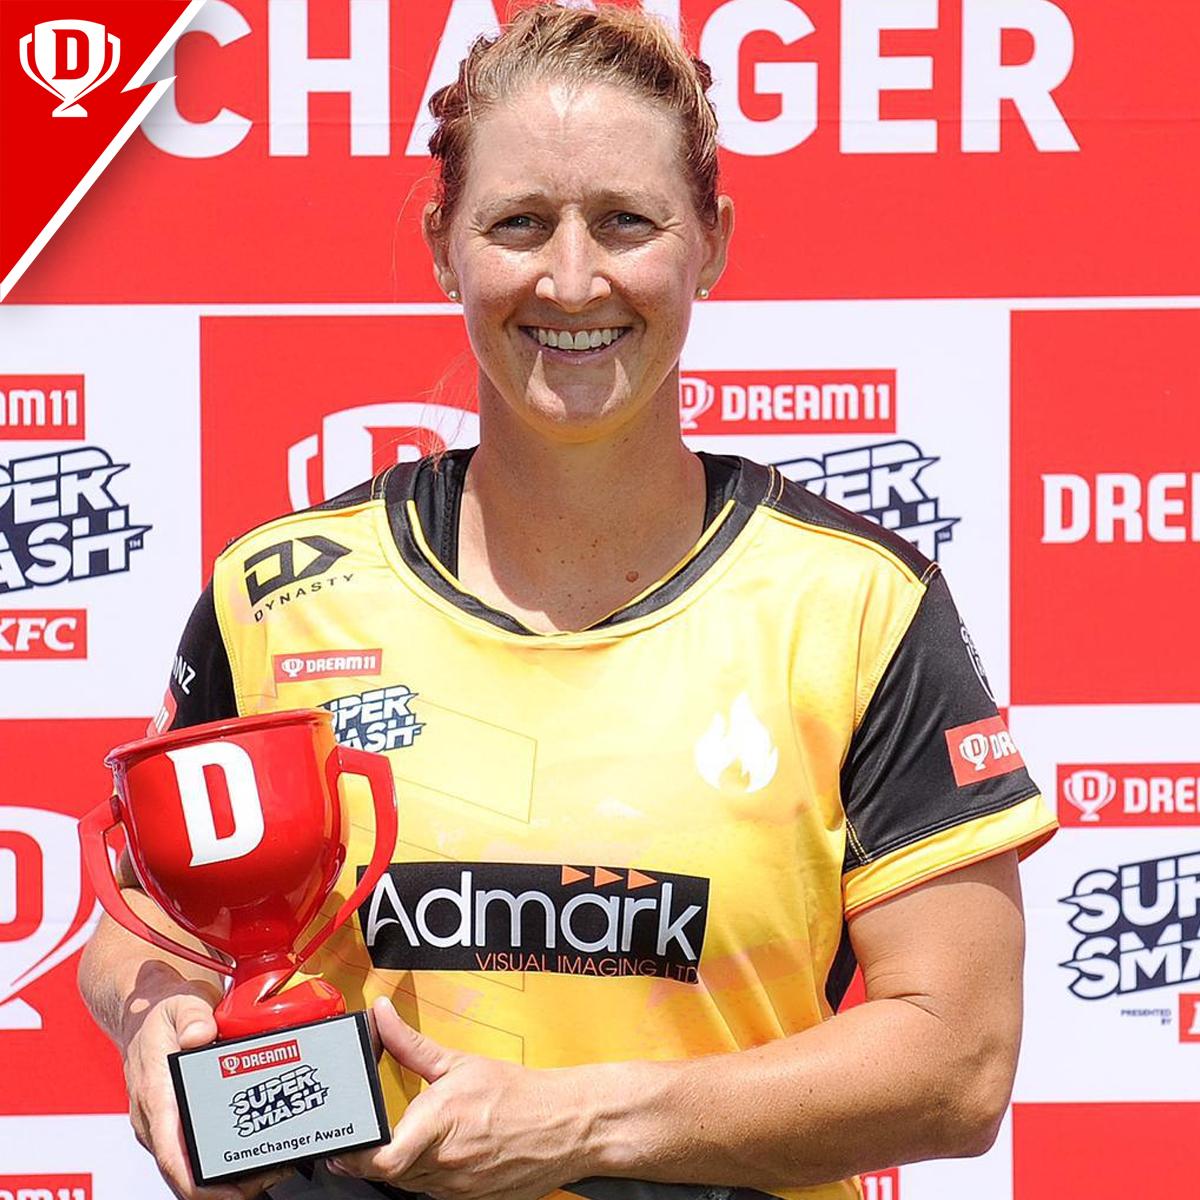 Brilliant hitting in their respective matches saw Sophie Devine (108 runs off 38 balls) and Finn Allen (92 runs off 43 balls) win the #Dream11GameChanger awards in today's #Dream11 @SuperSmashNZ matches ⭐️  Congratulations! 👌